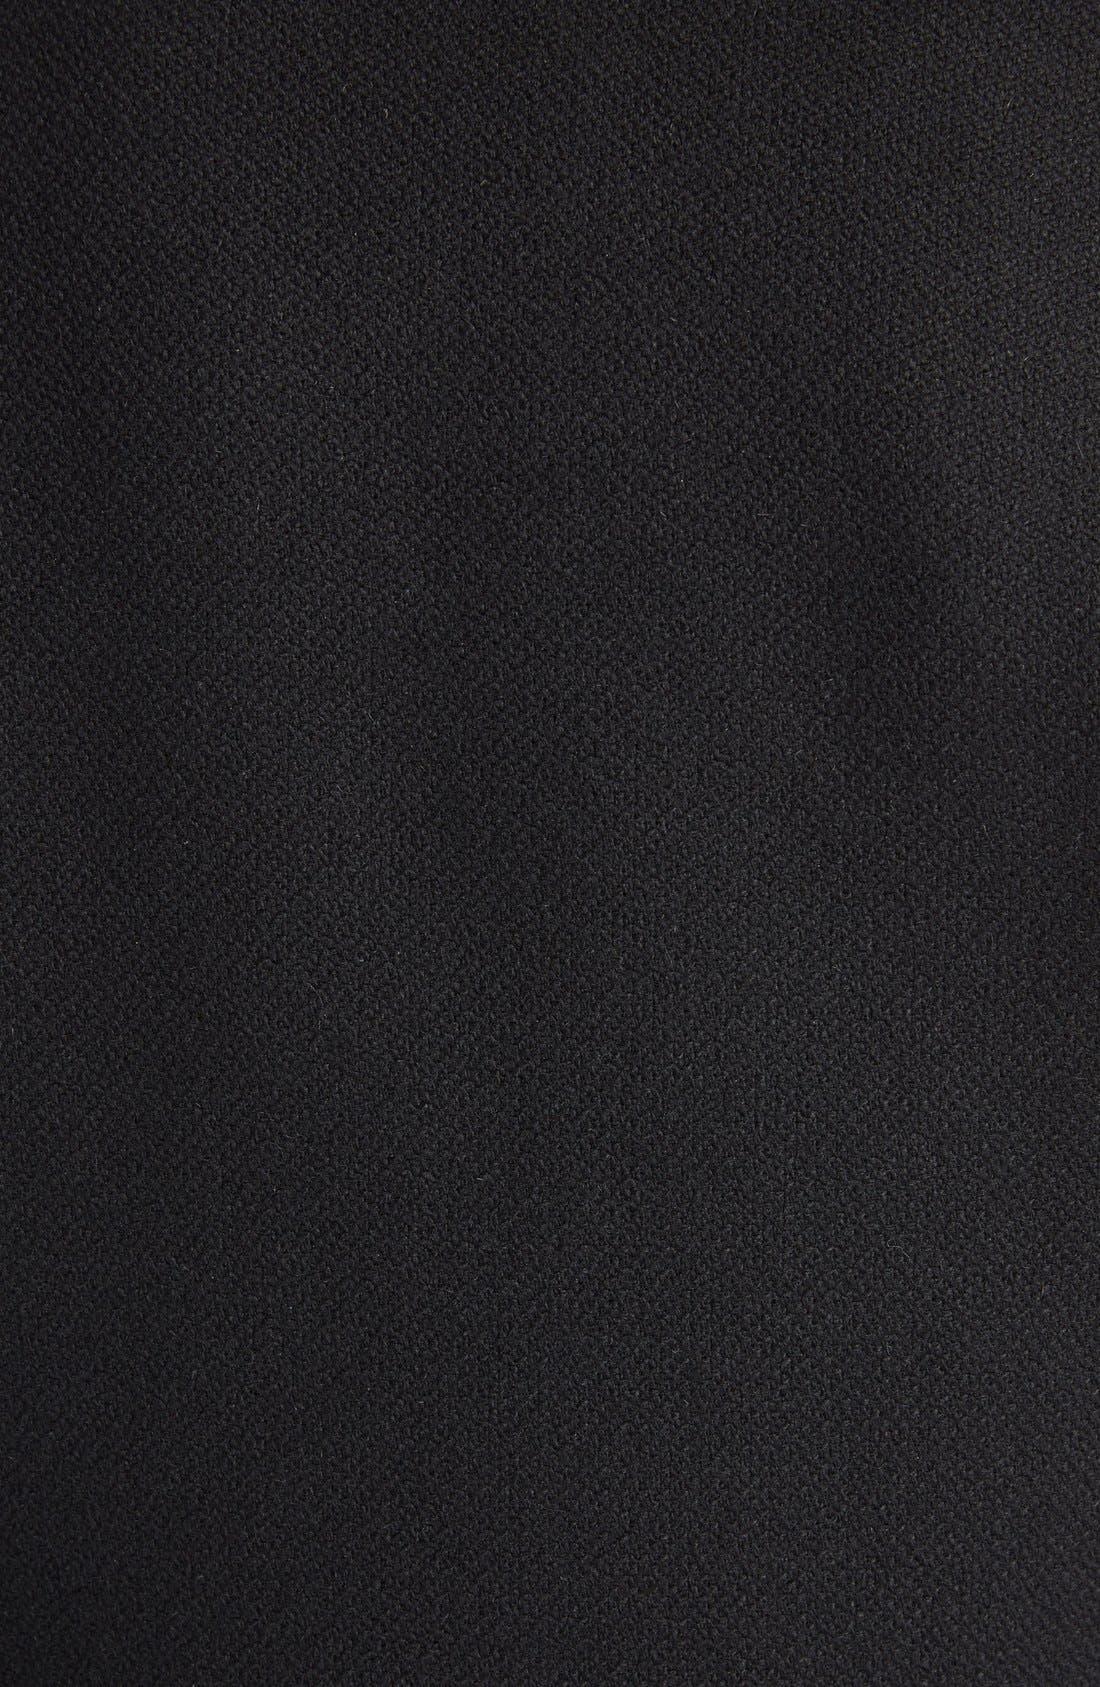 Alternate Image 3  - Saint Laurent 'Teddy' Full Leather Sleeve Bomber Jacket